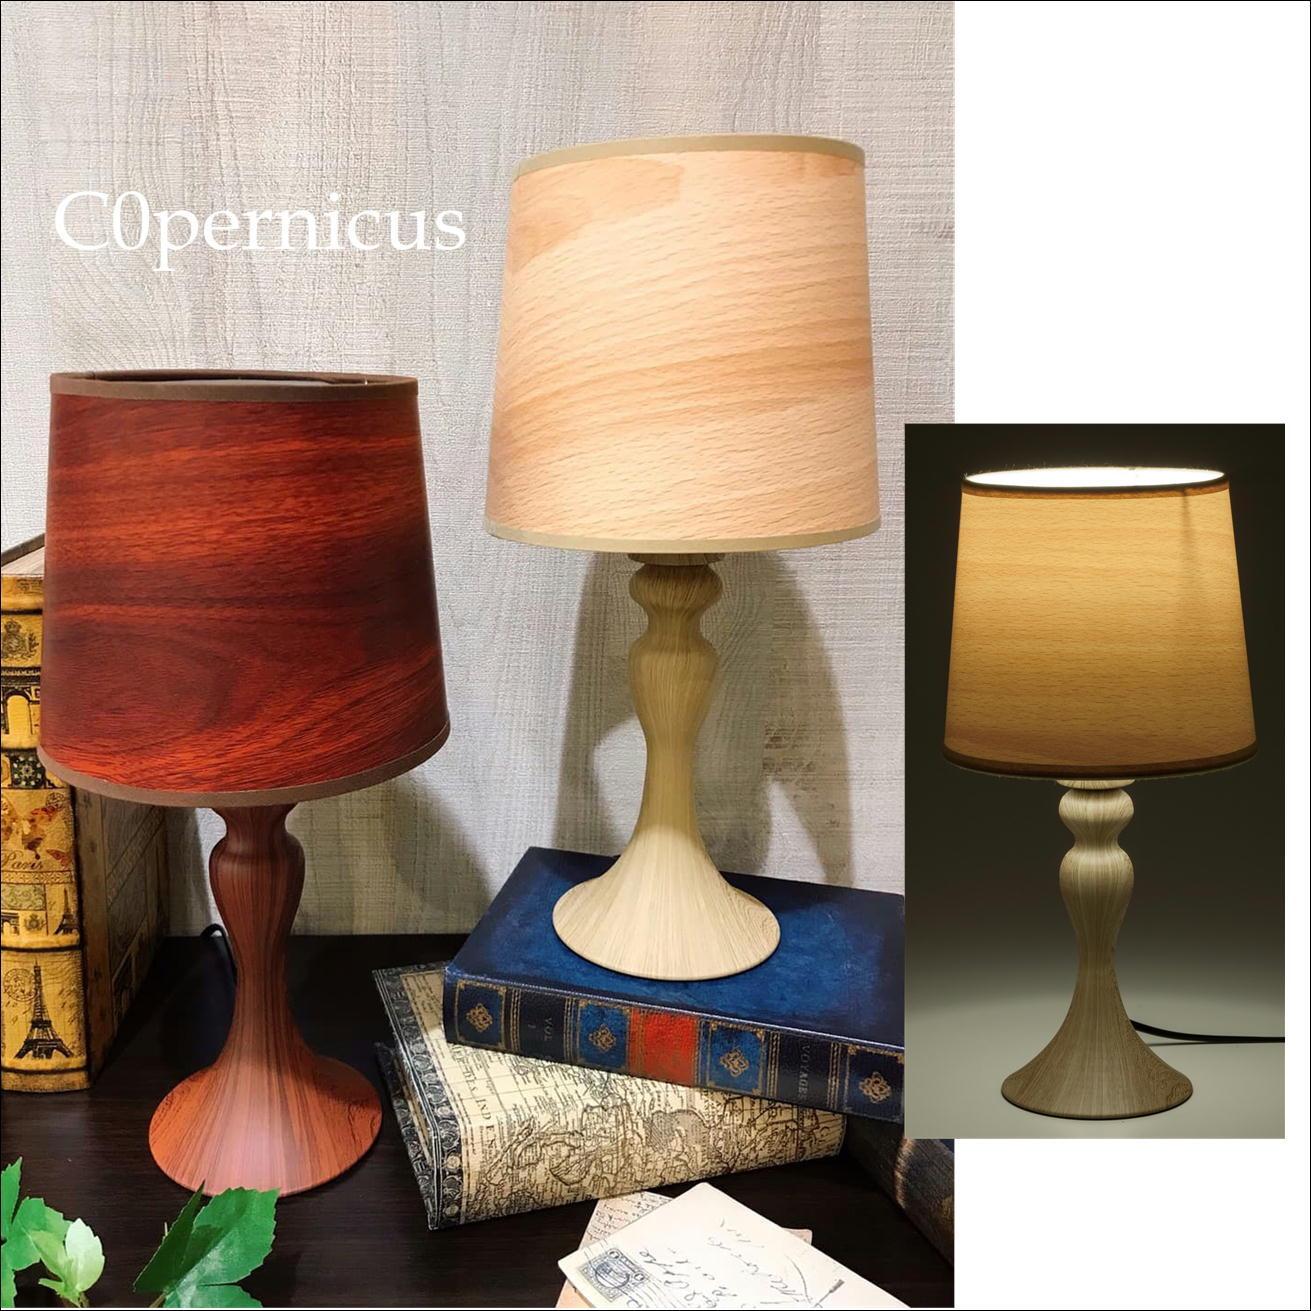 2color ウッド調LEDランプ(タッチセンサー式)アンティークランプ/浜松雑貨屋C0pernicus